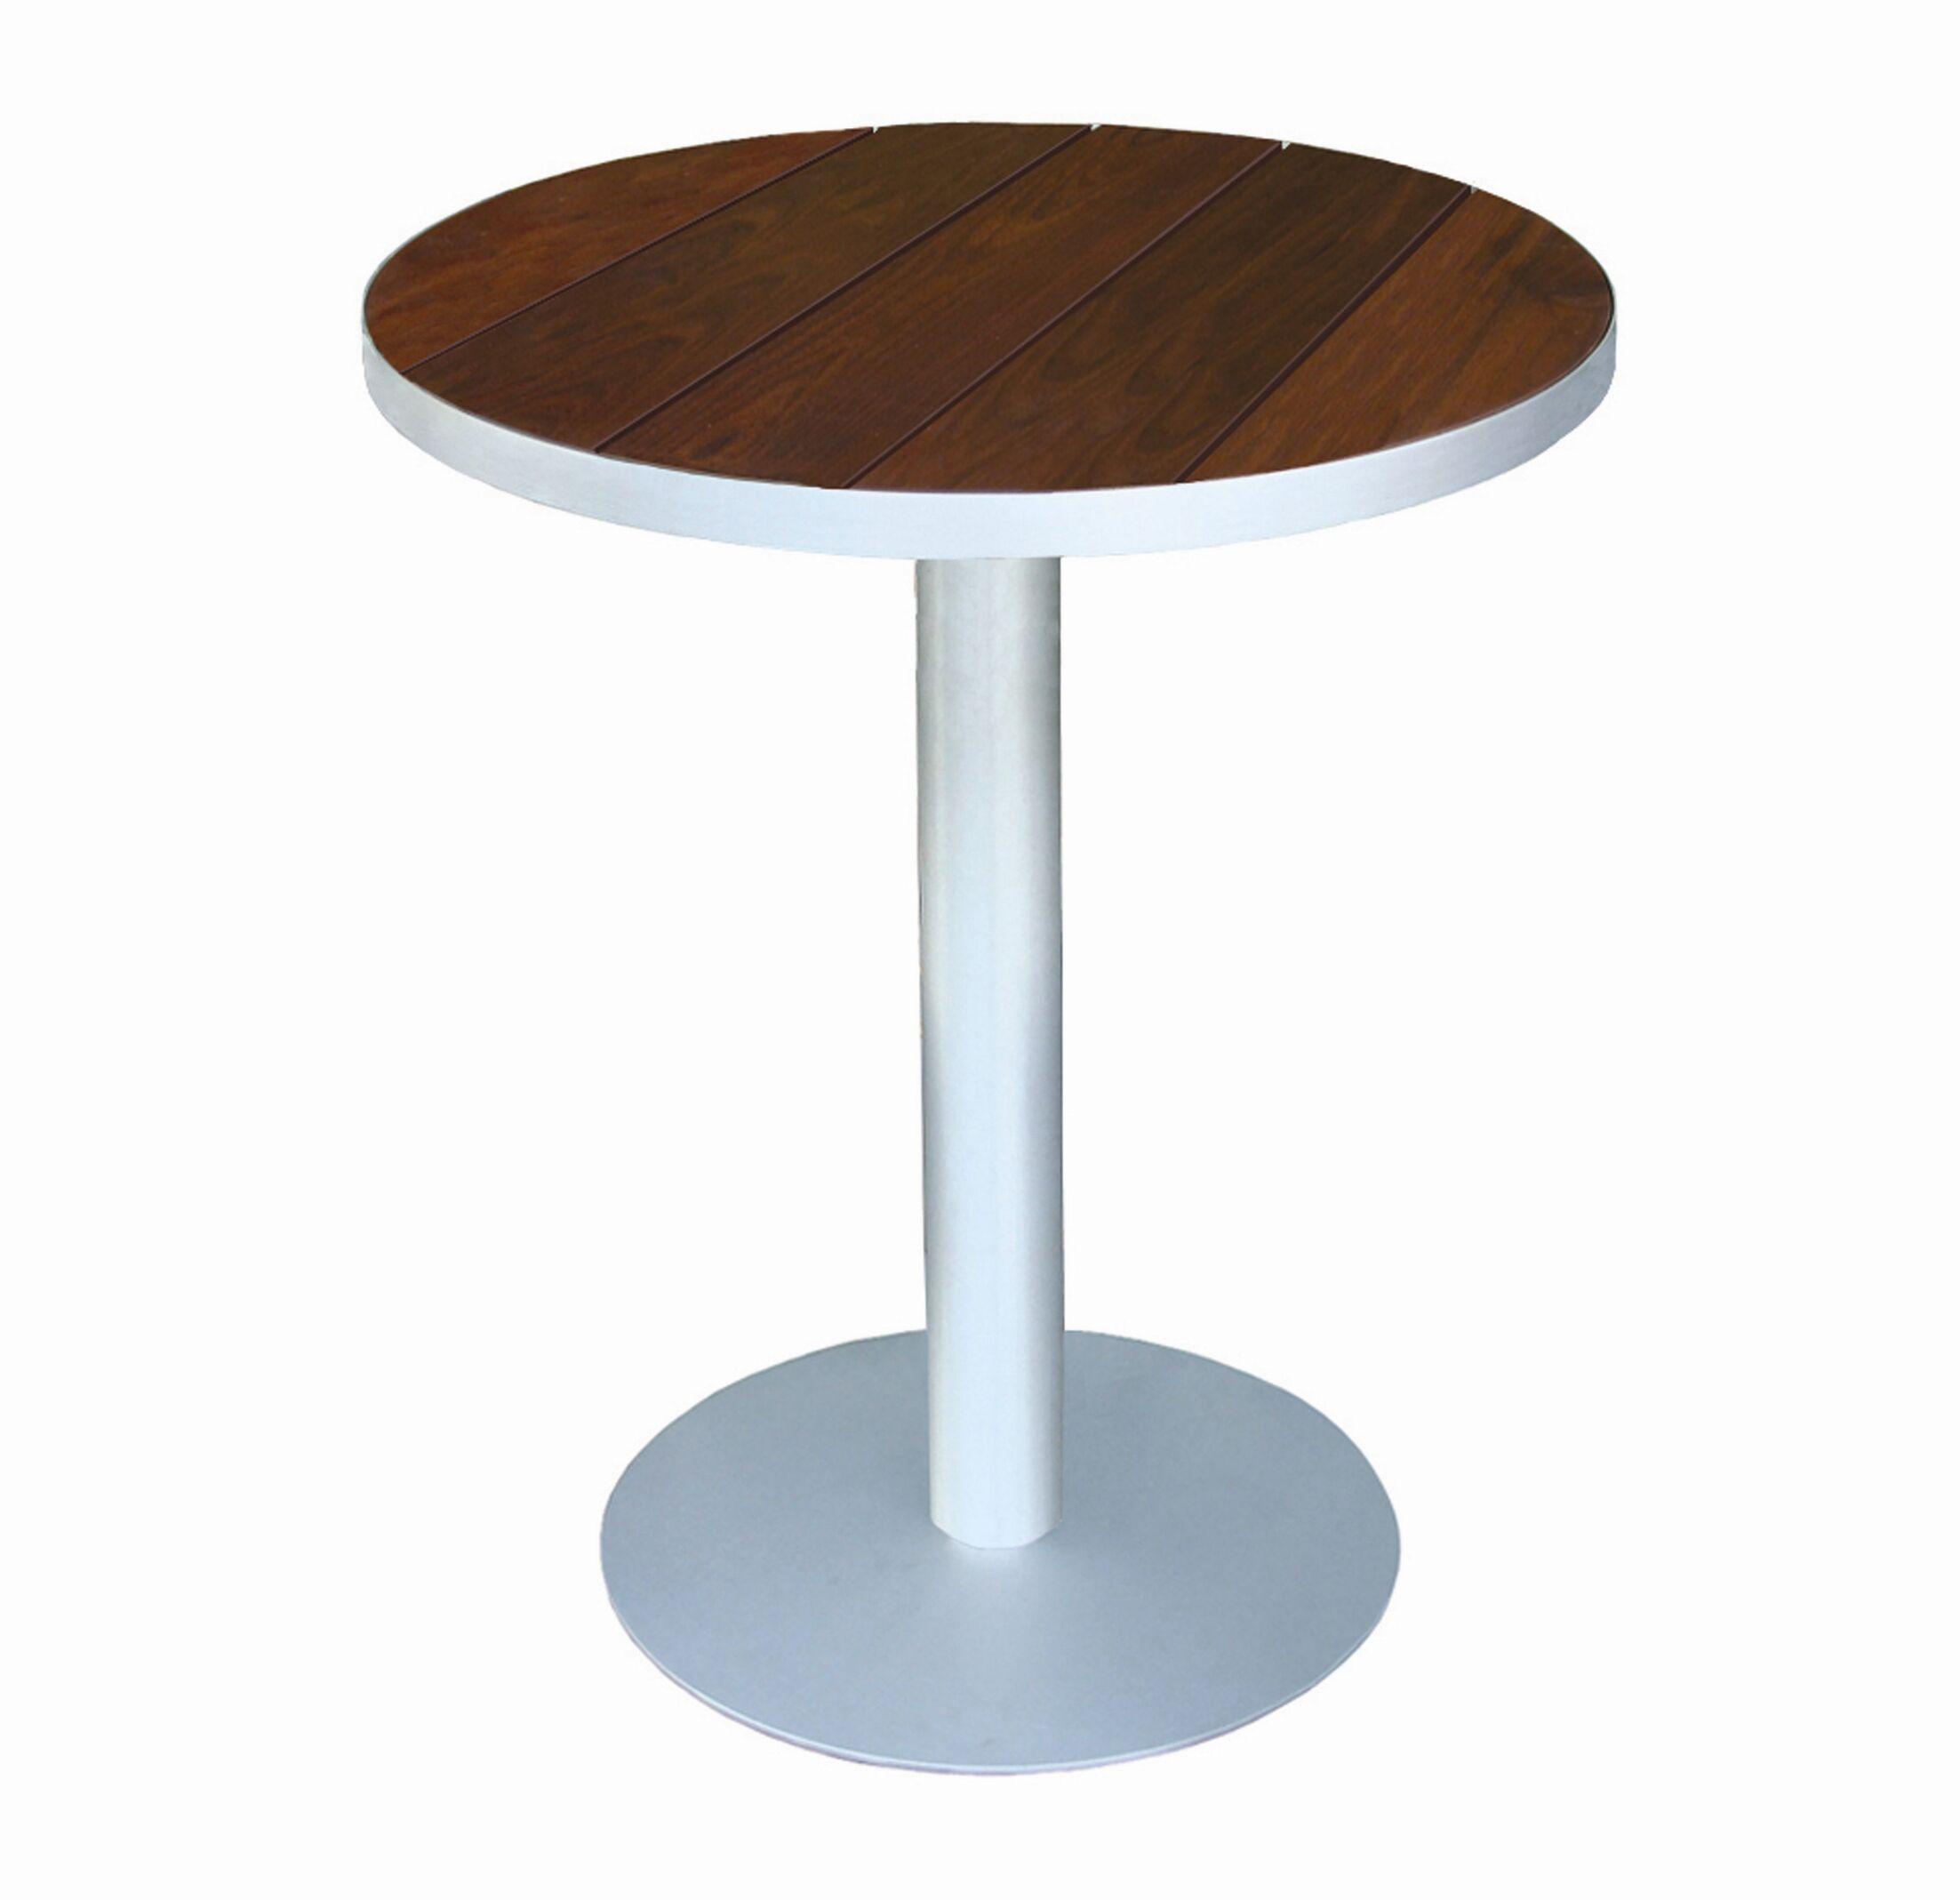 Luma Bistro Table Table Size: 24